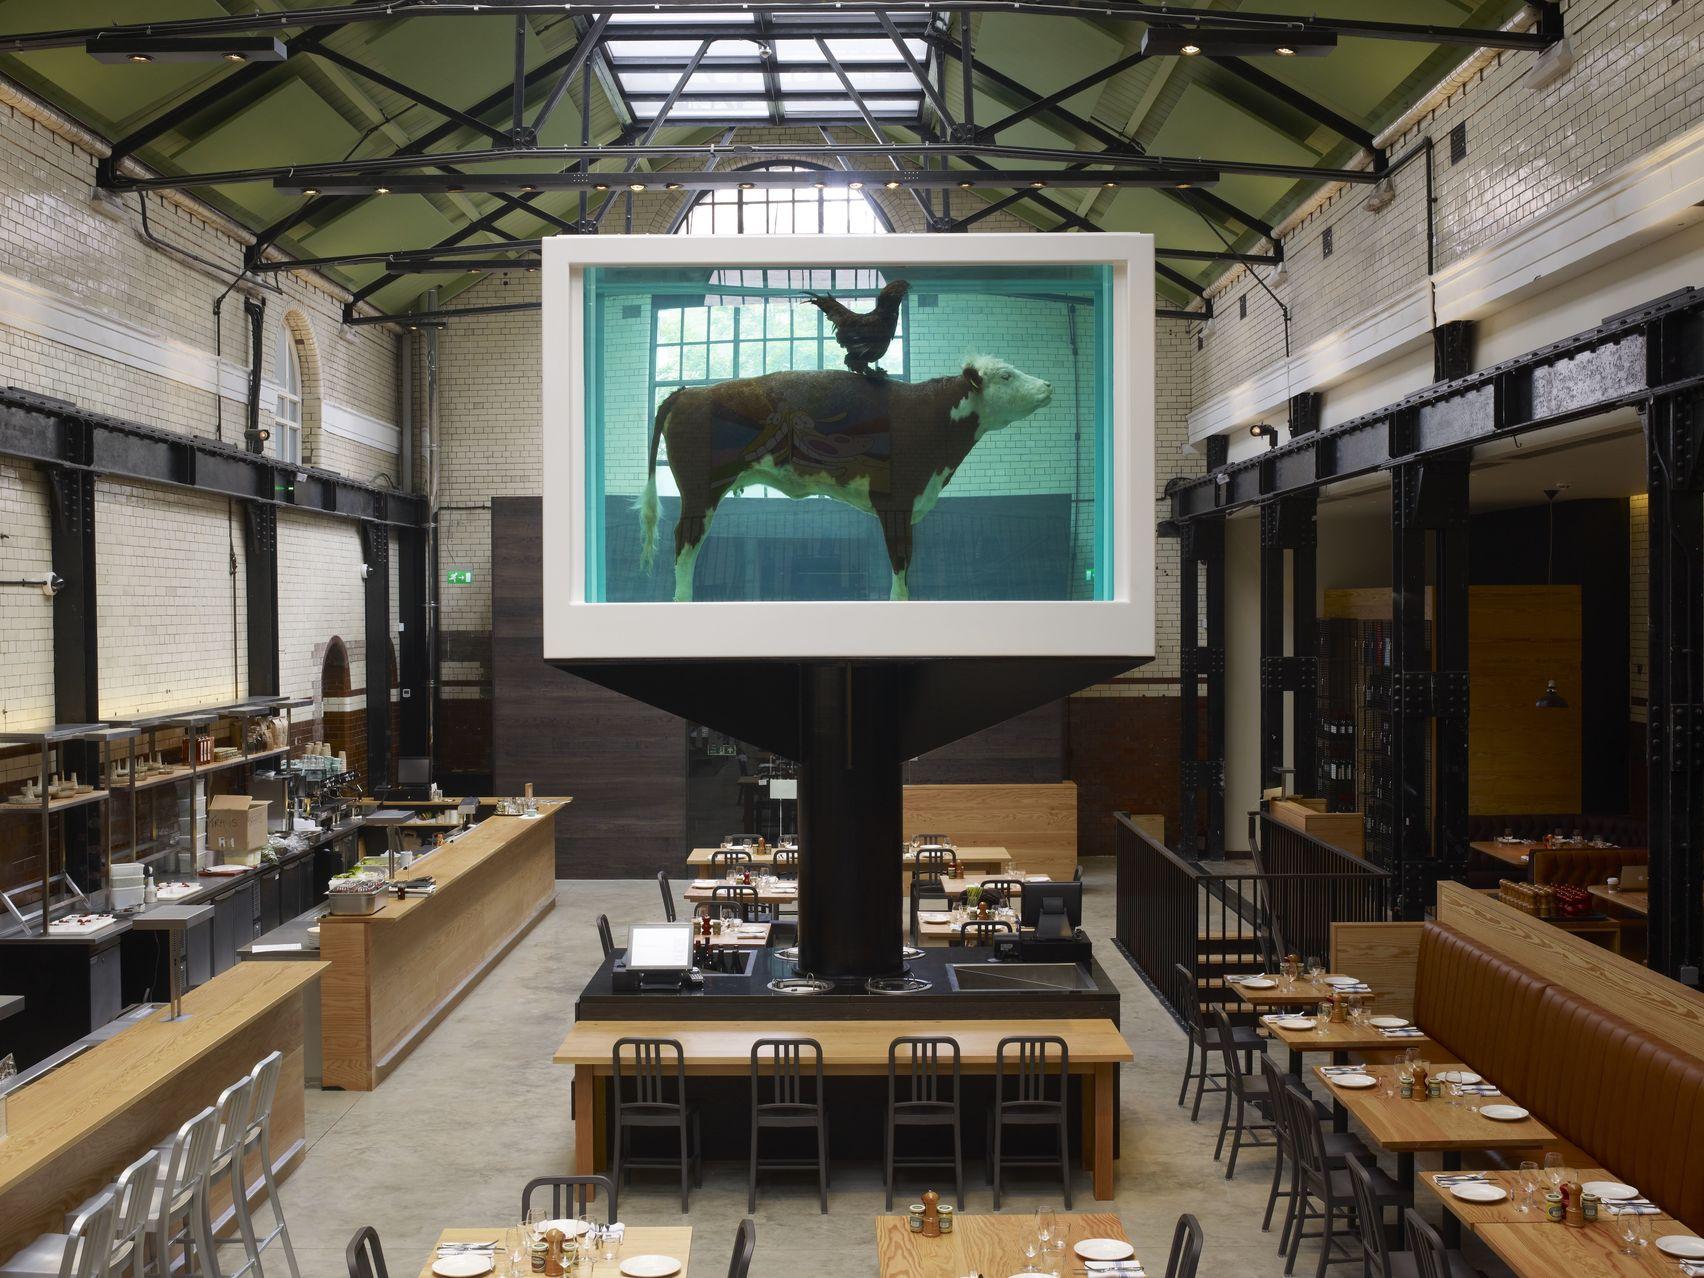 Lunch Hire, Mezzanine, Tramshed by Mark Hix